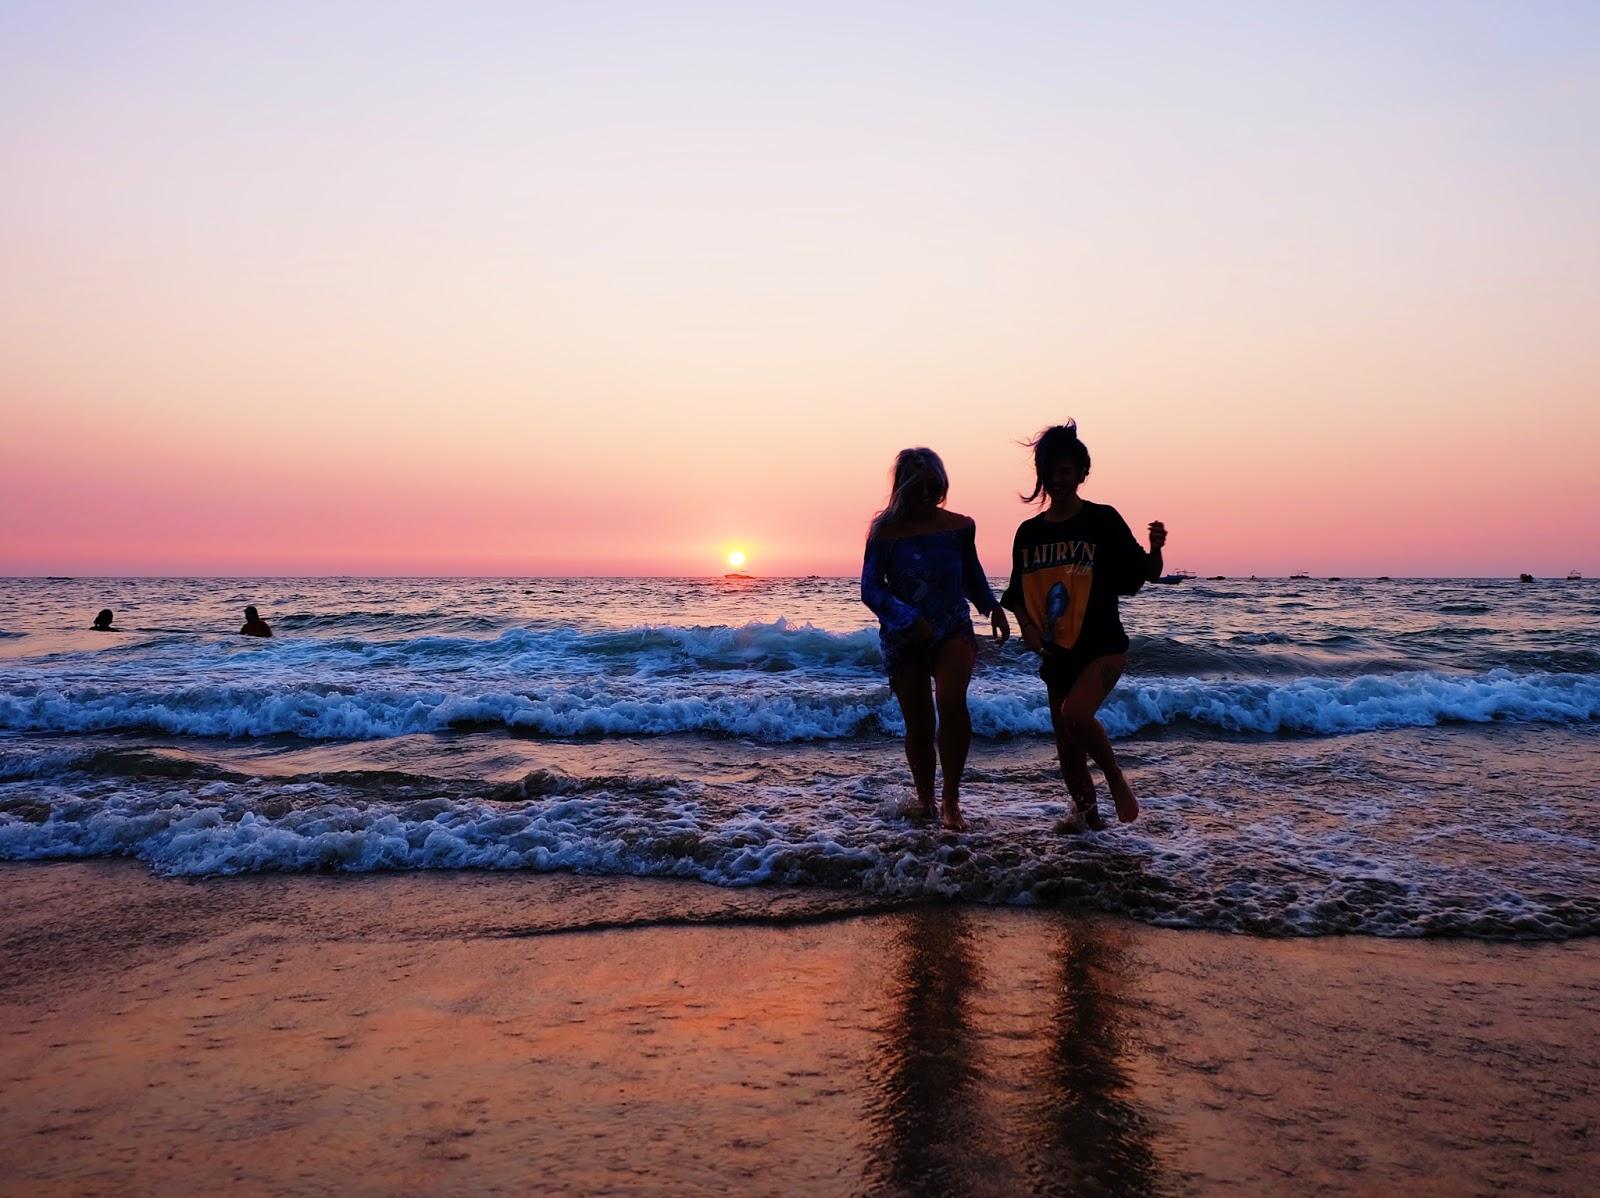 SUNSET ON BAGA BEACH